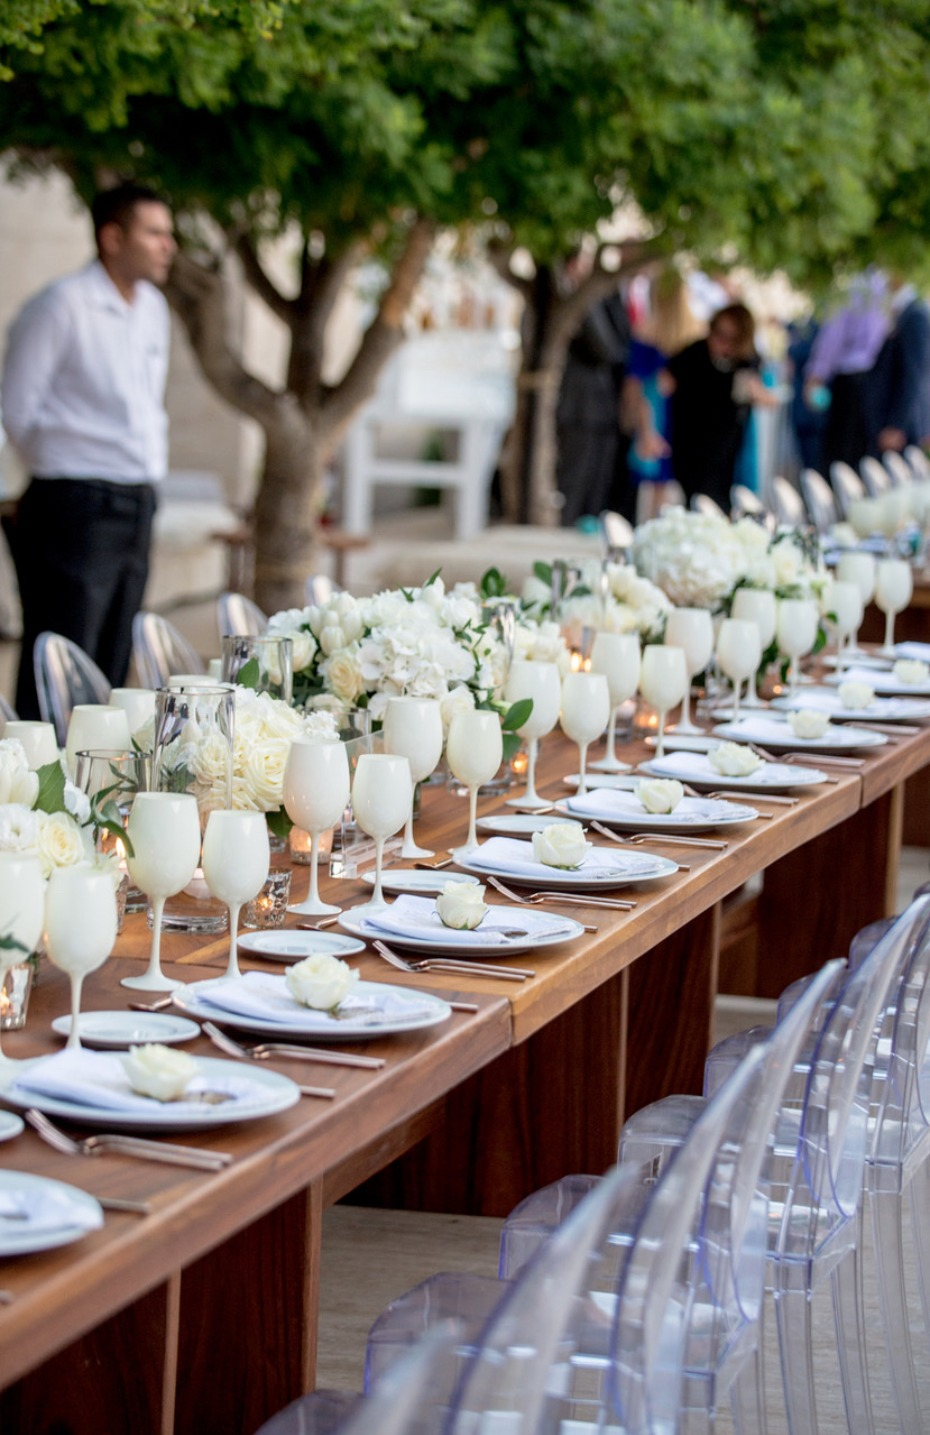 Weddings at JW Marriott Los Cabos